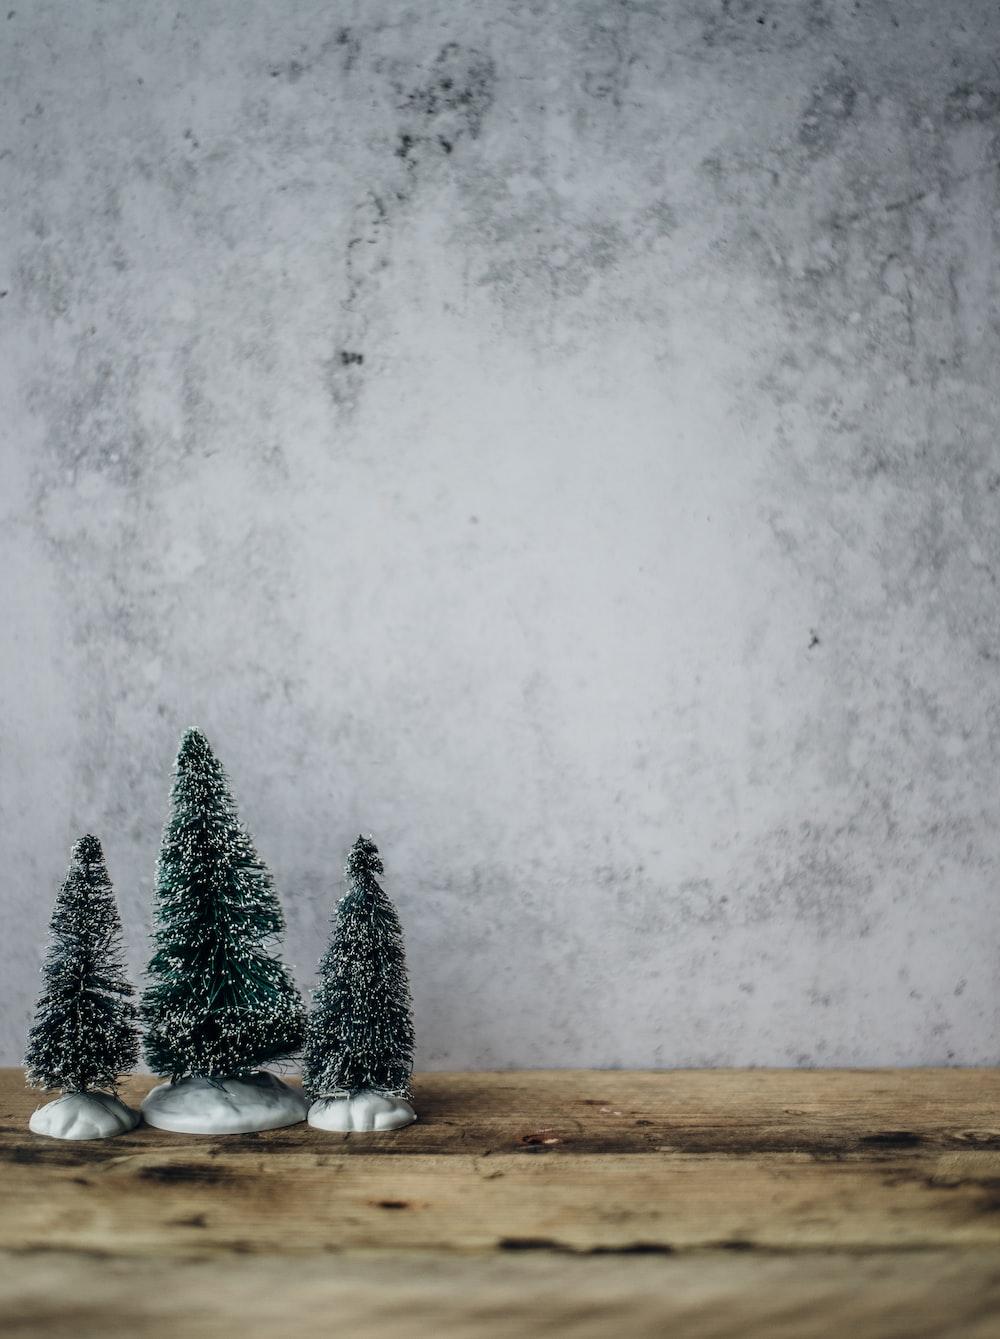 three green pine tree miniature near gray concrete wall